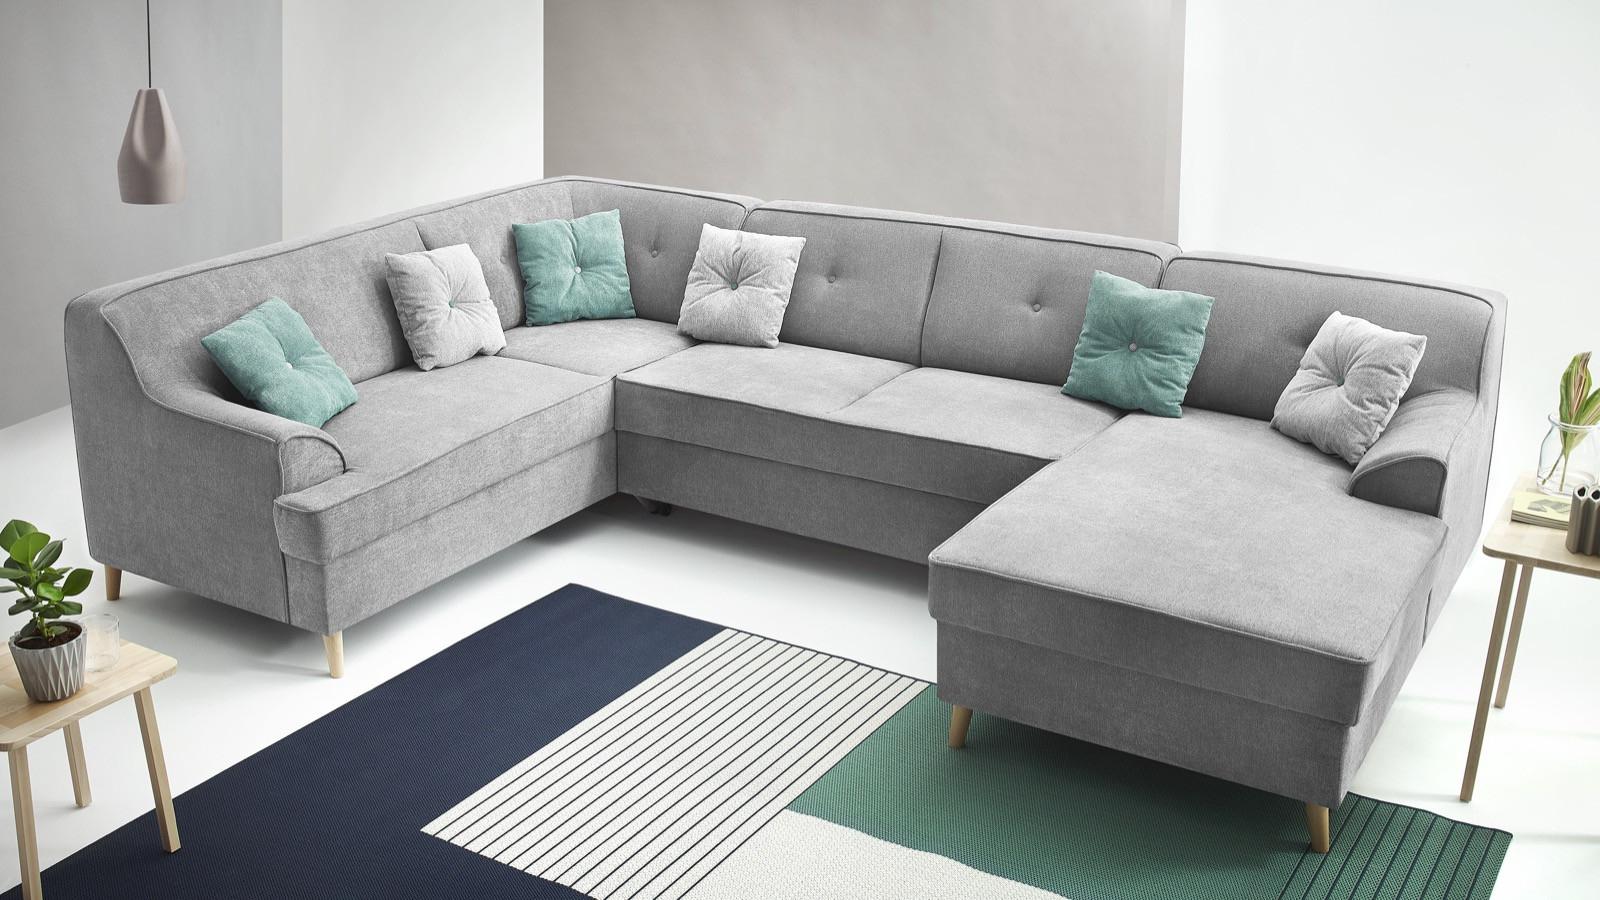 Sofa Panoramic Xxxl Convertible Alfa | Bobochic ® à Table De Jardin Xxl